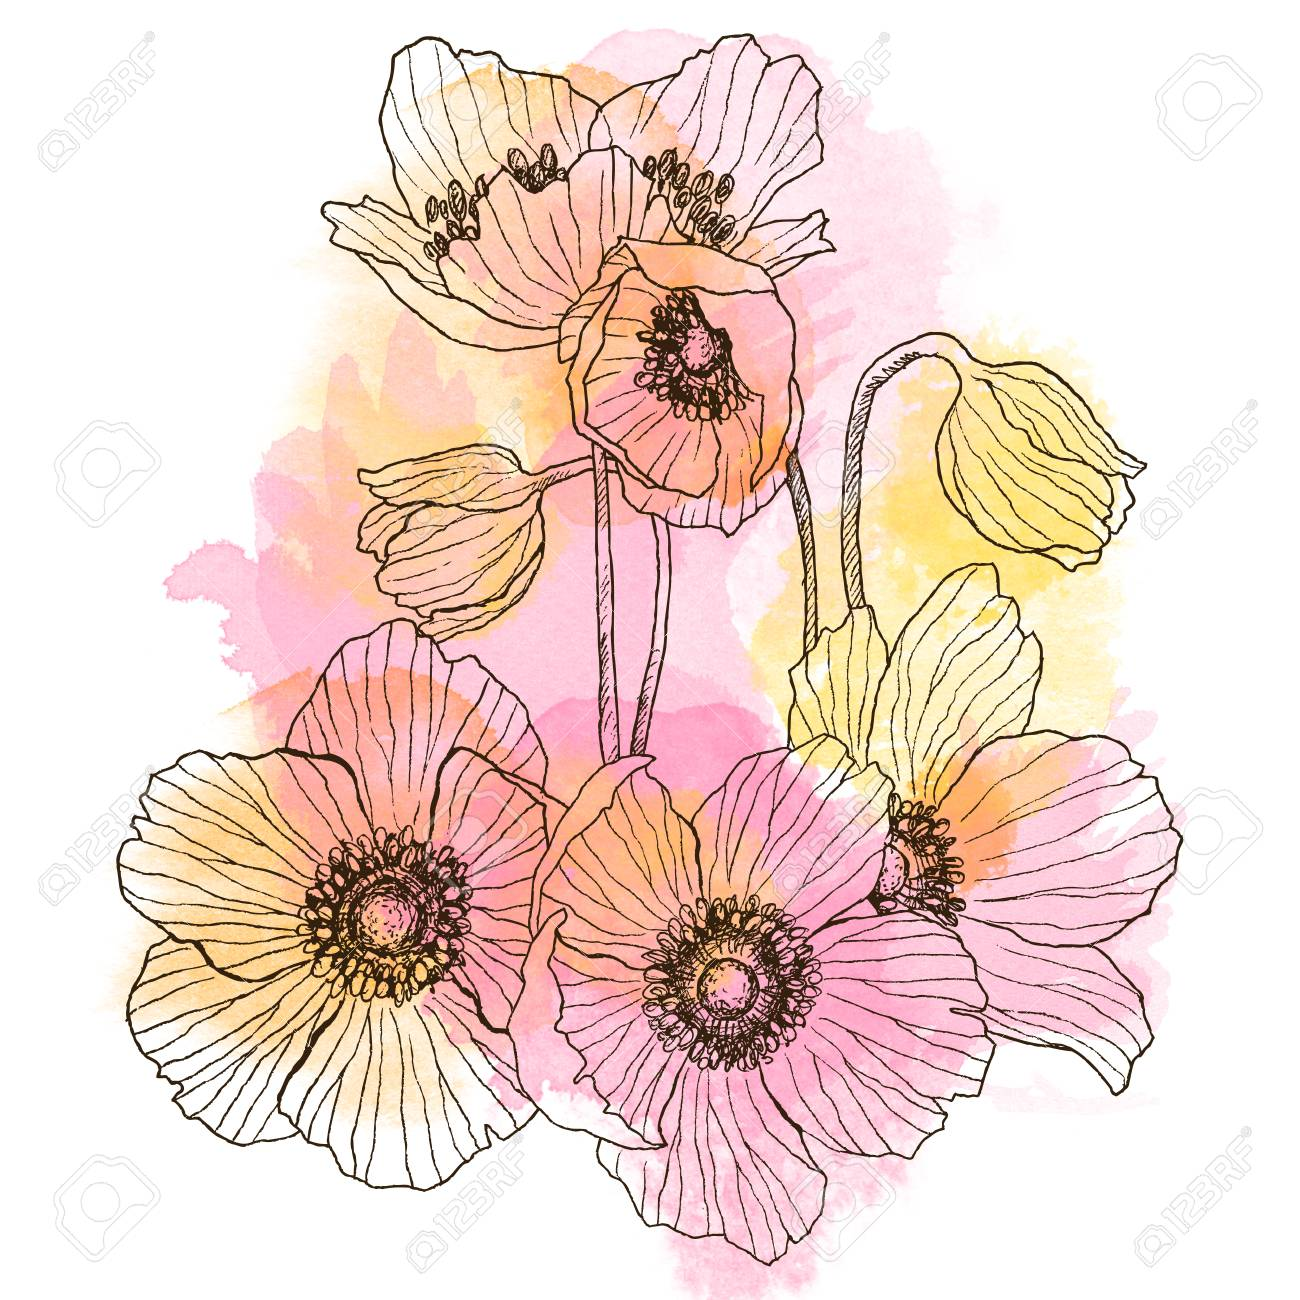 Anemone Concept Art